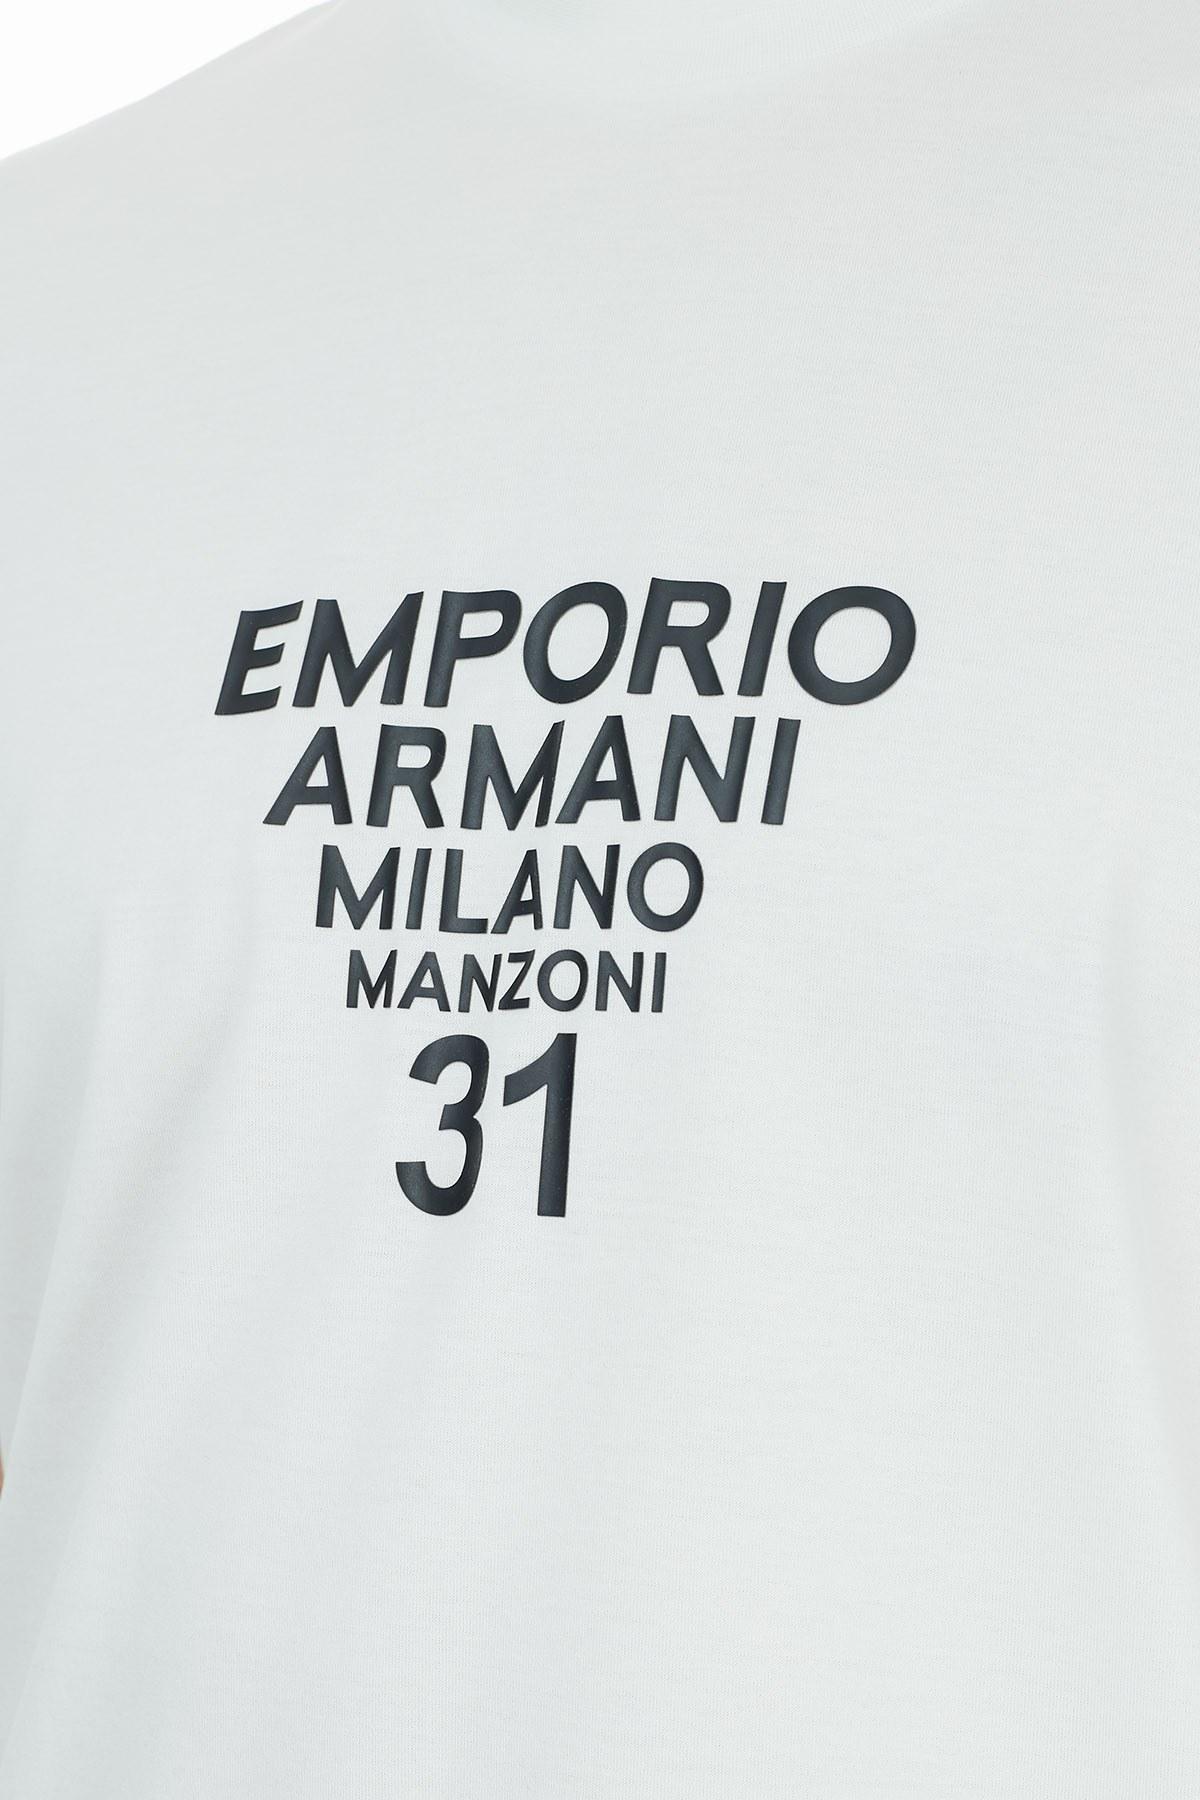 Emporio Armani Baskılı Bisiklet Yaka % 100 Pamuk Erkek T Shirt 6H1TG5 1JTUZ 0151 BEYAZ